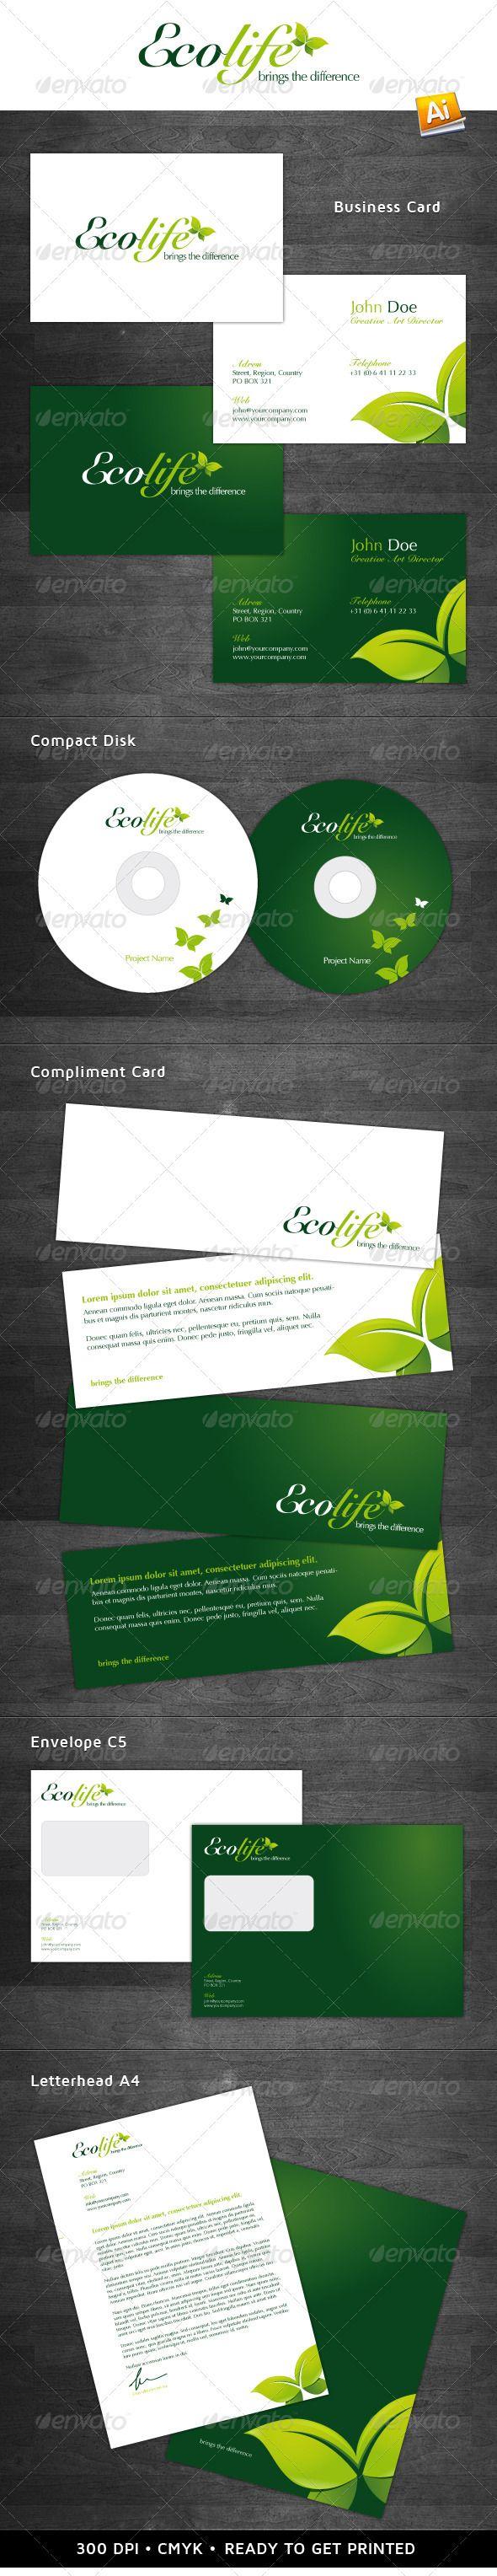 Ecolife Corporate Identity